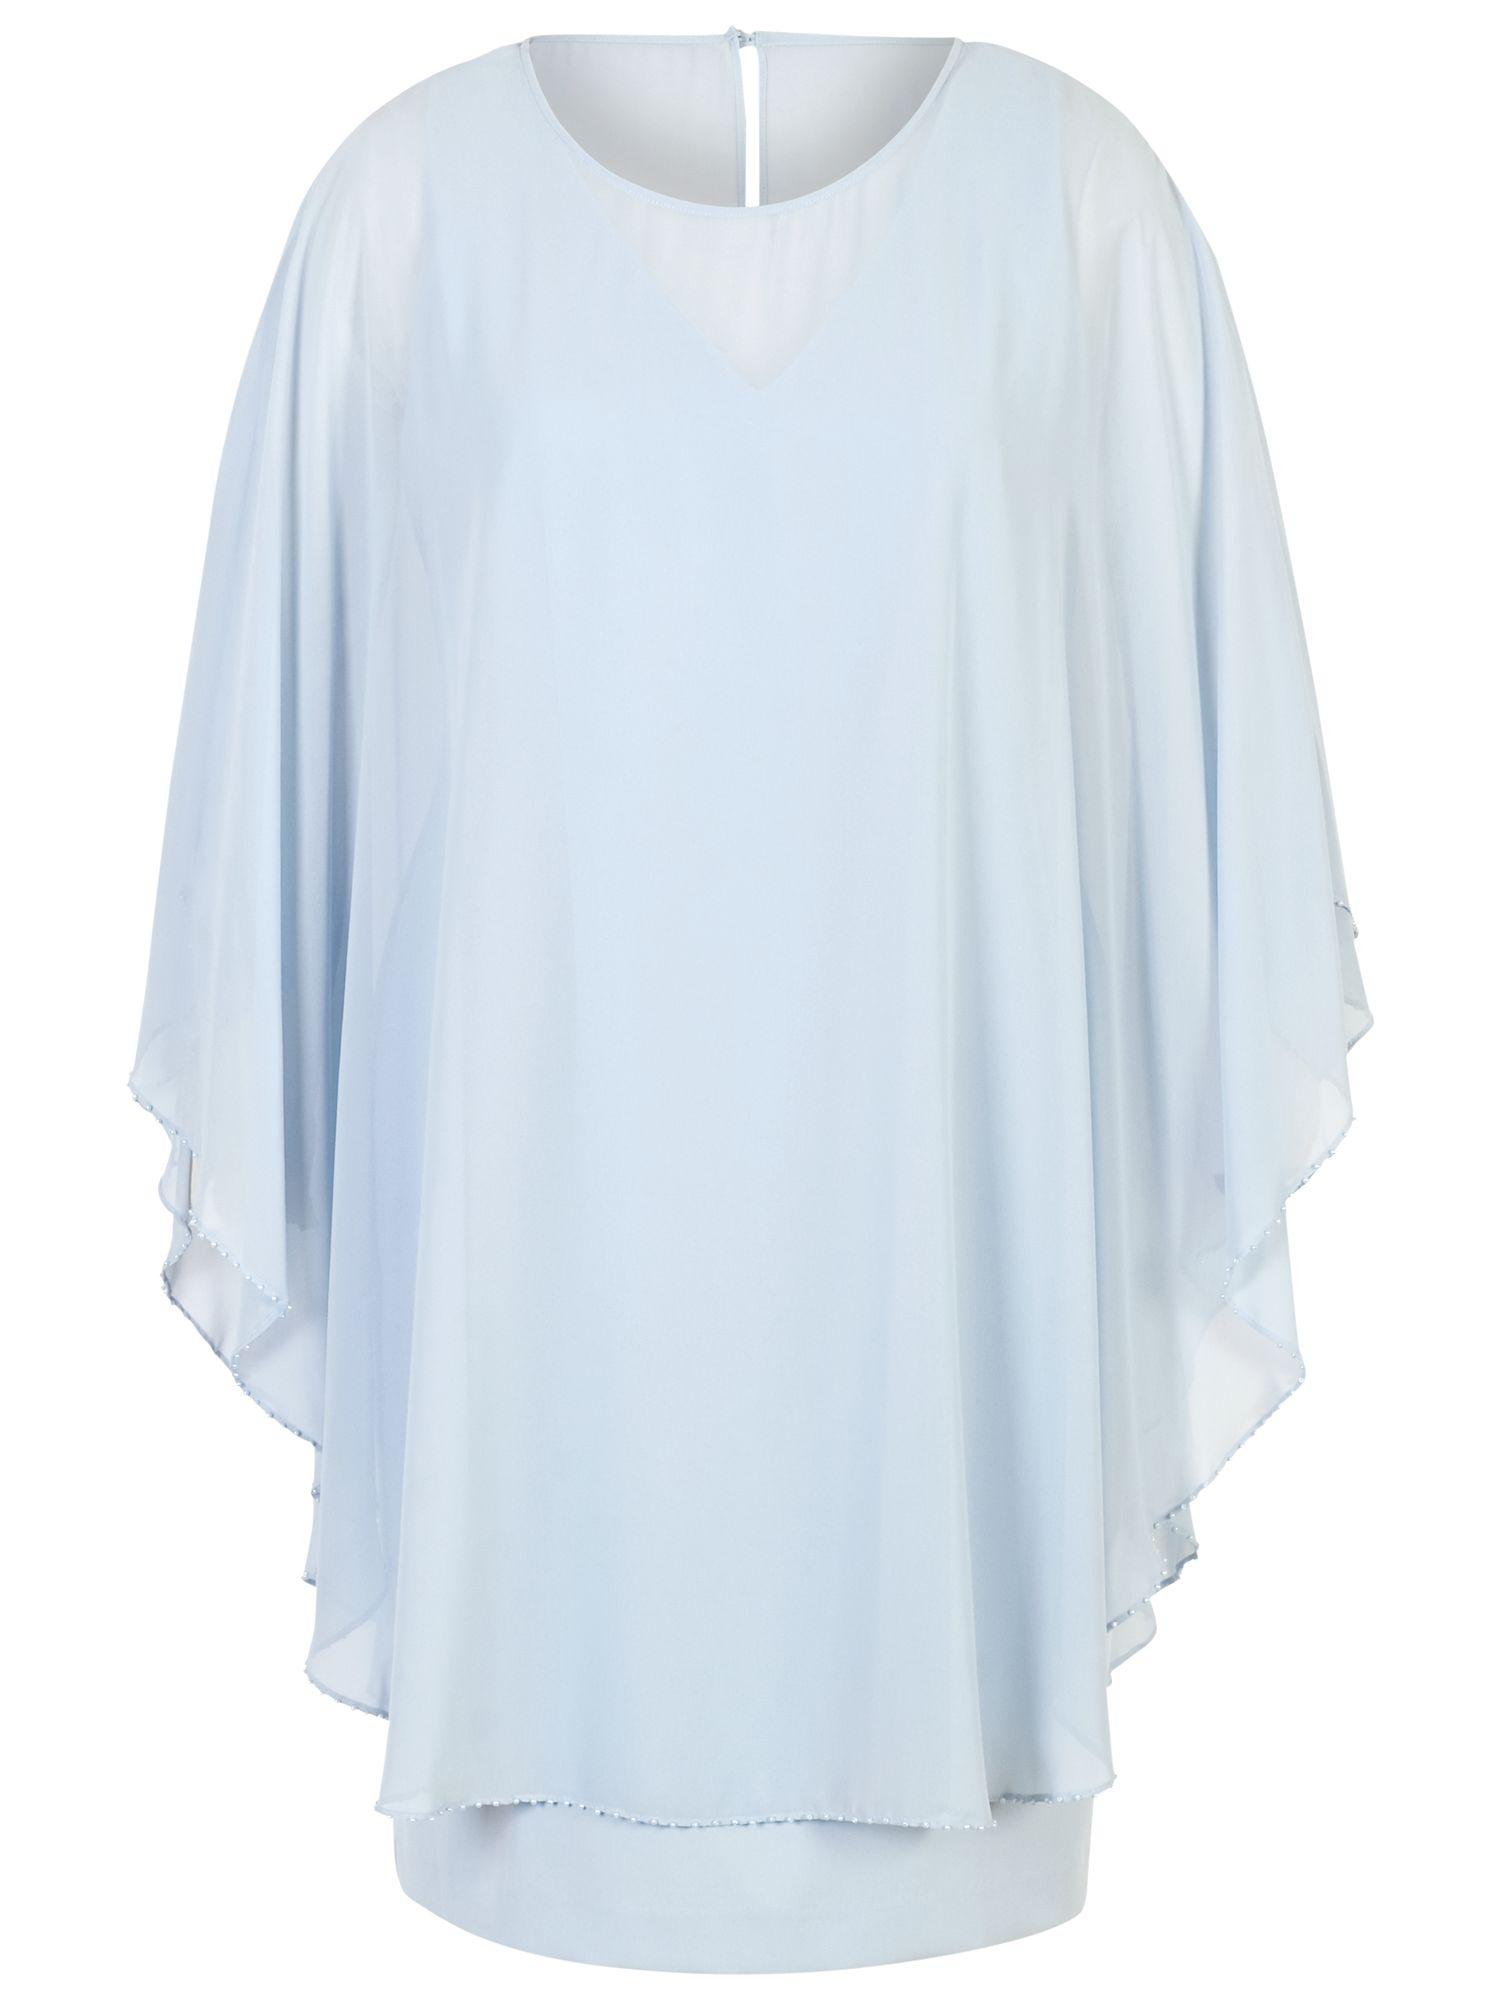 Chesca Chesca Cape Dress, Apple Mist Blue